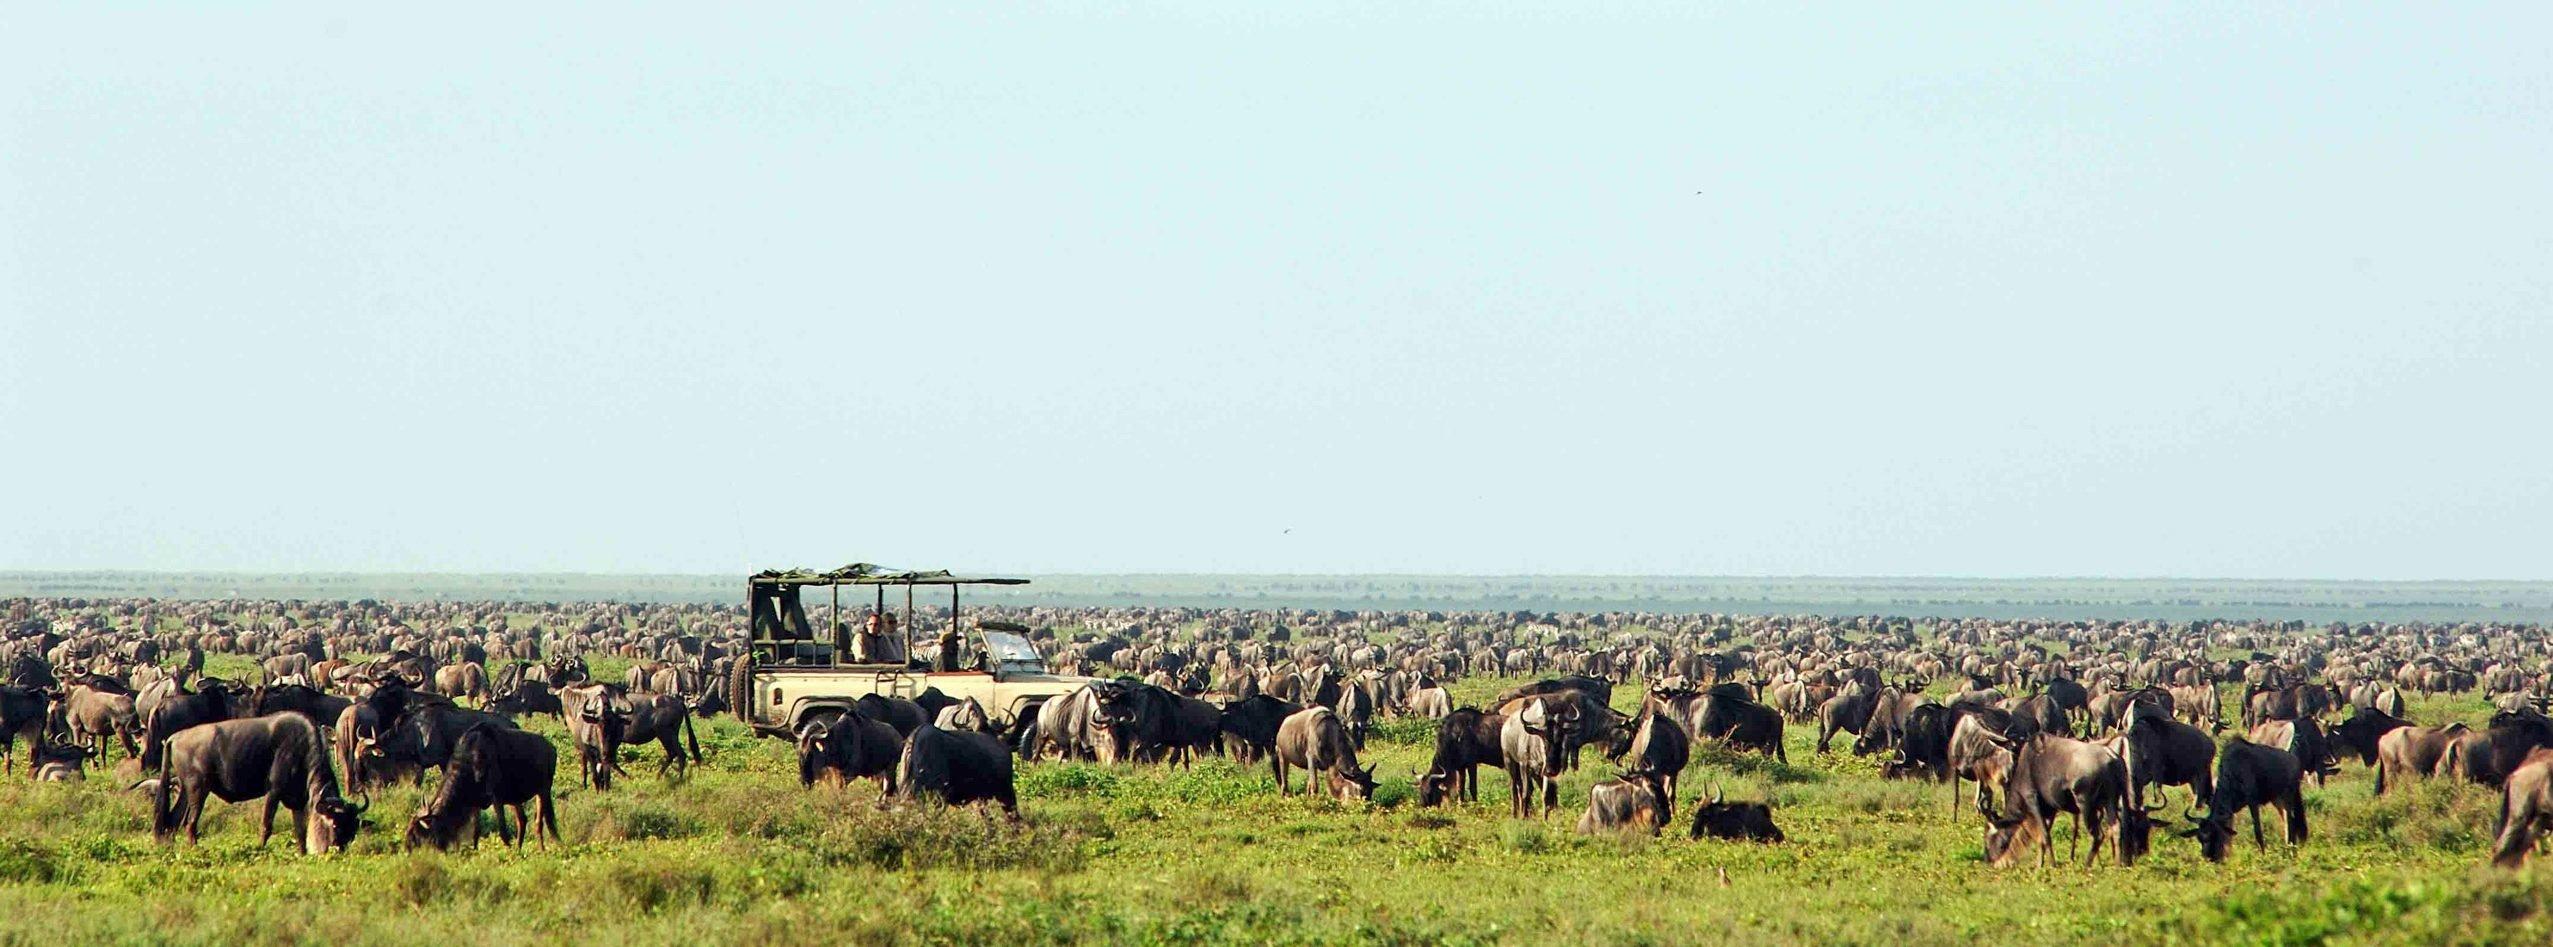 Great Migration safari, Tanzania, Africa